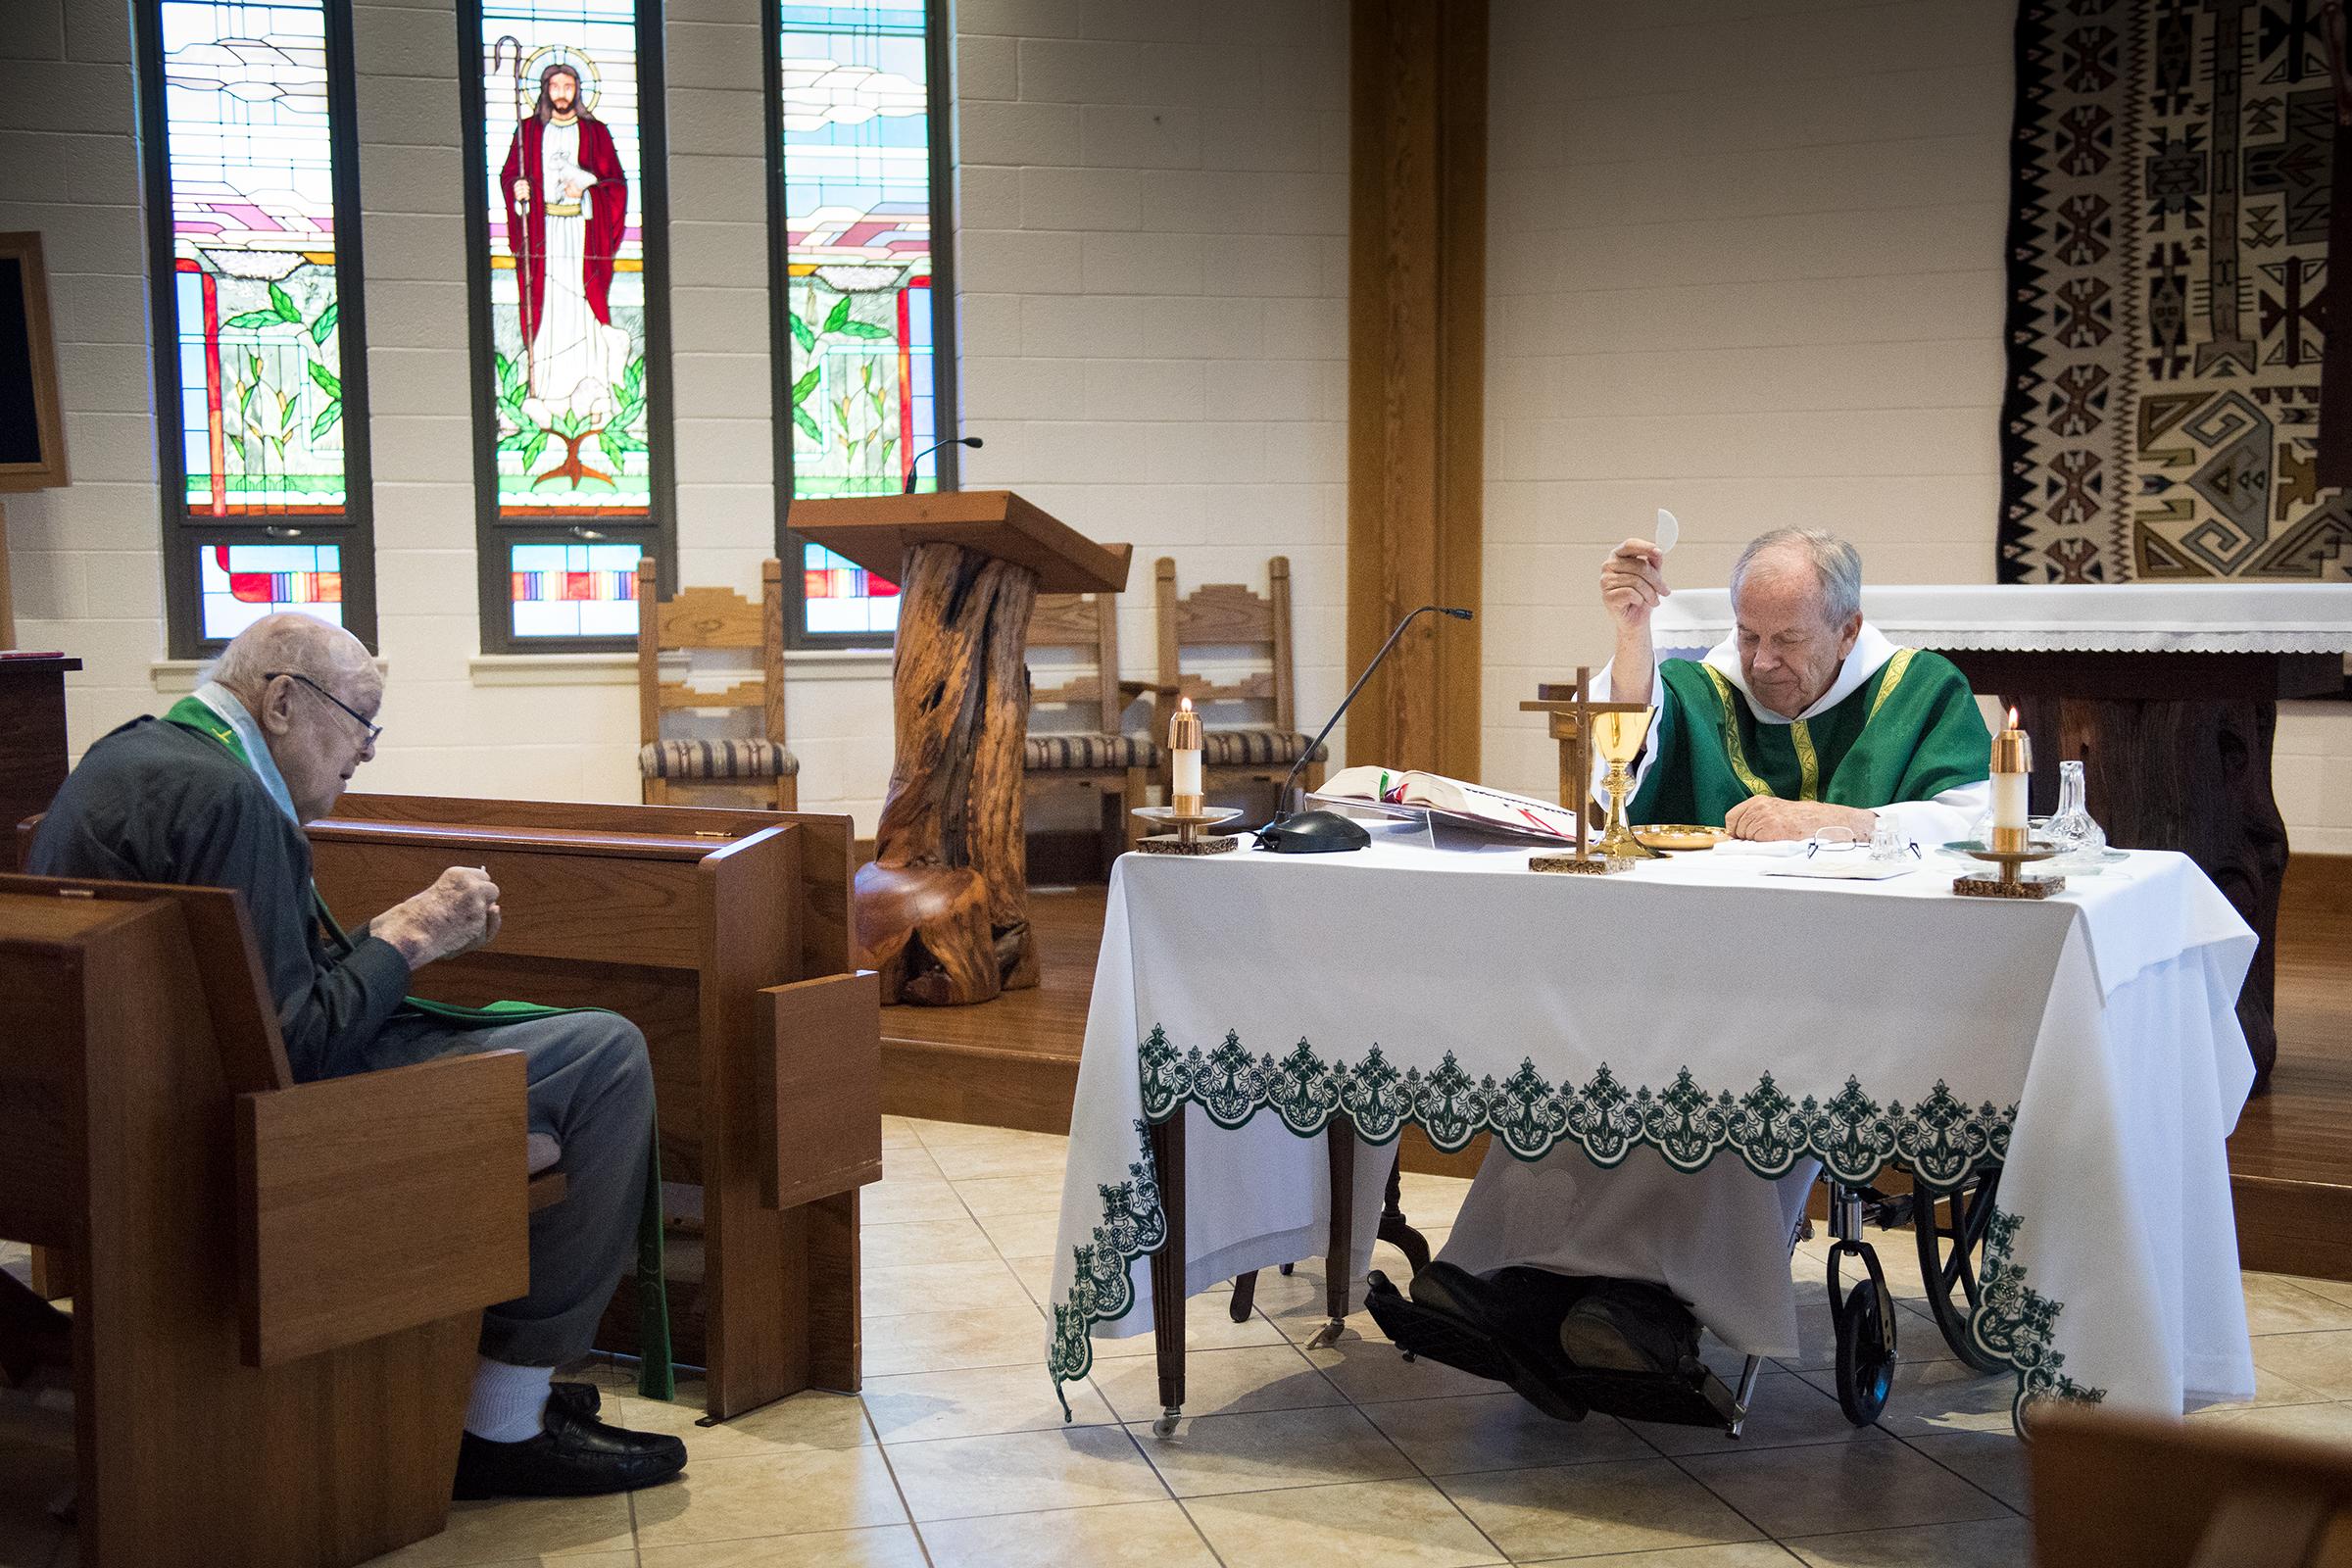 ELDERLY PRIESTS MASS